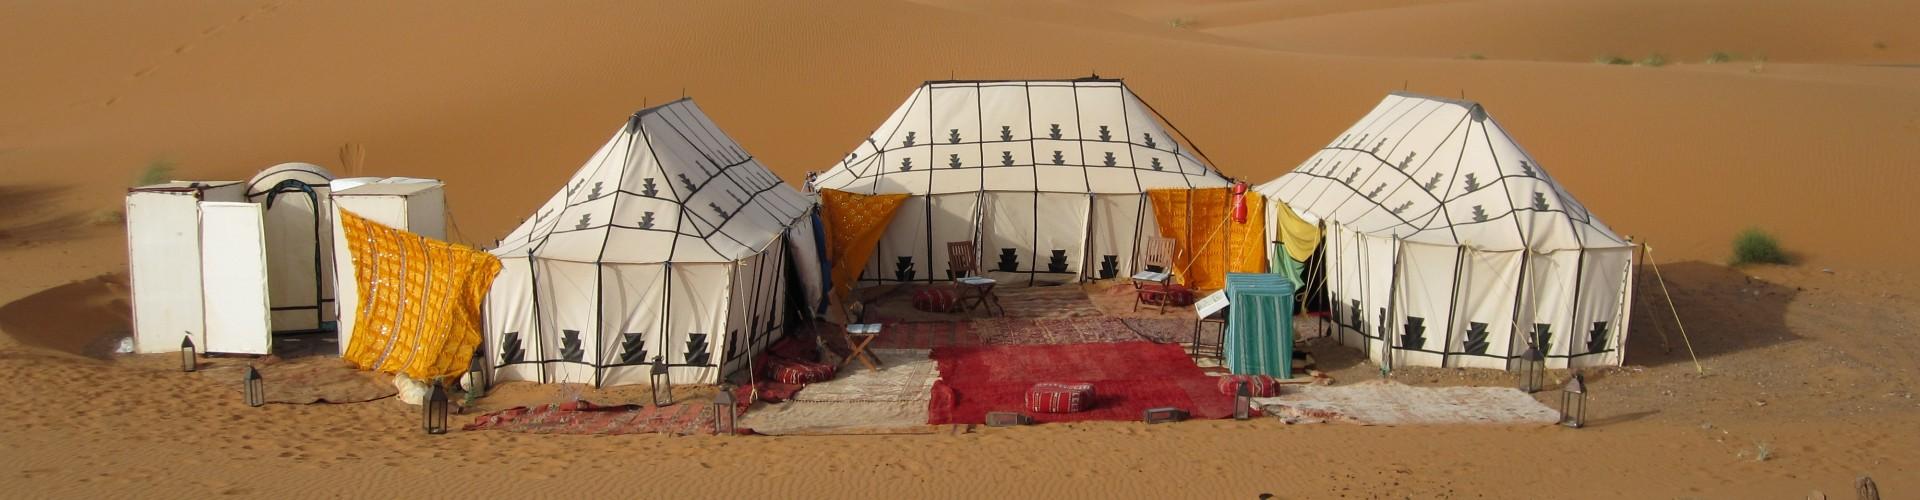 Morocco - Sahara Desert Camp